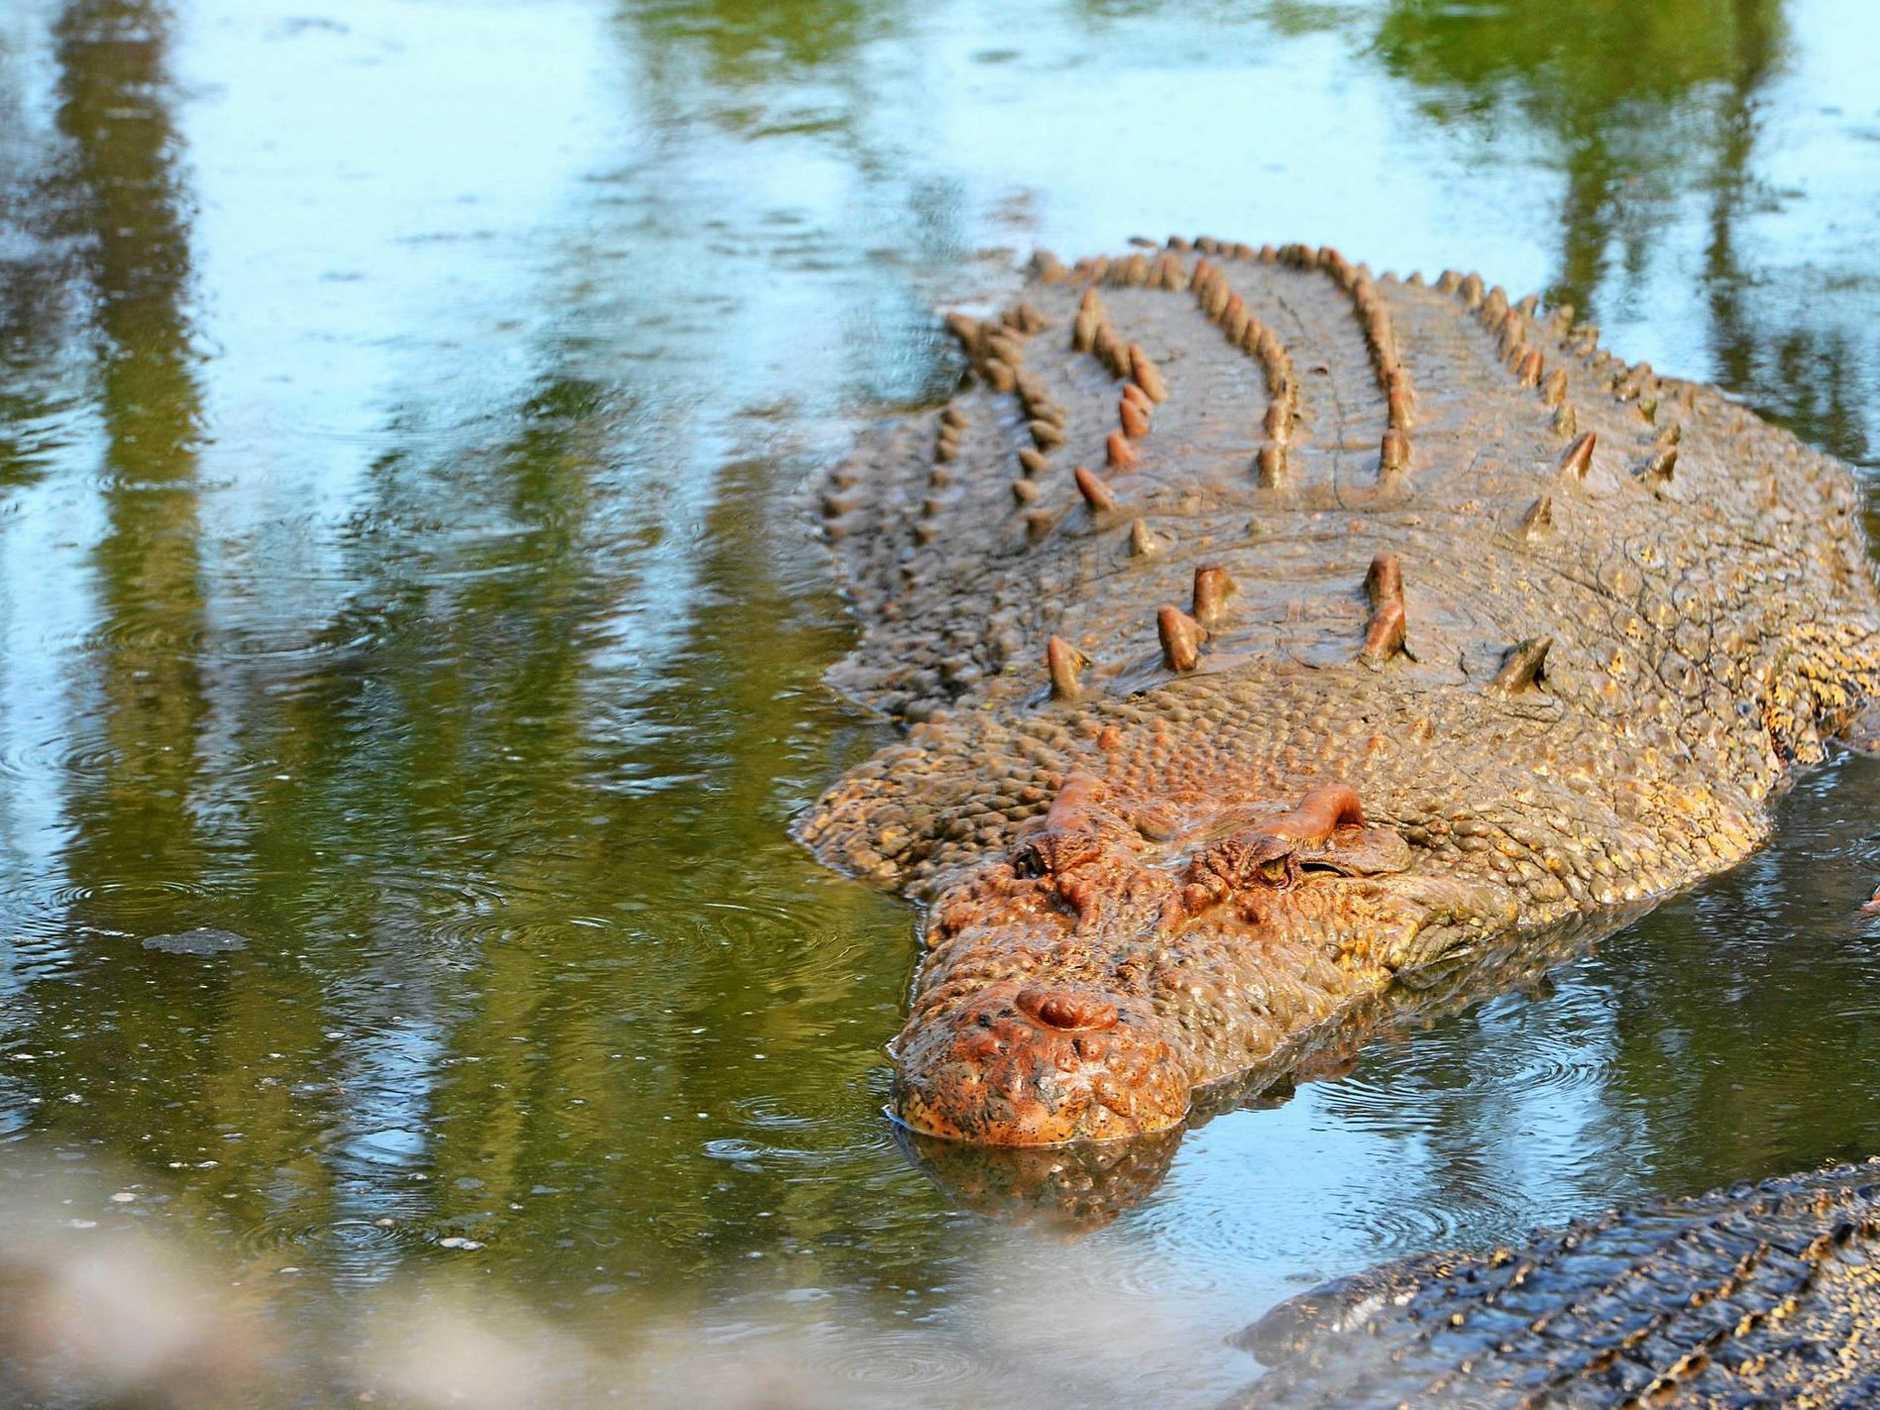 One of the large crocodiles on display at the Koorana Crocodile Farm on the Capricorn Coast.